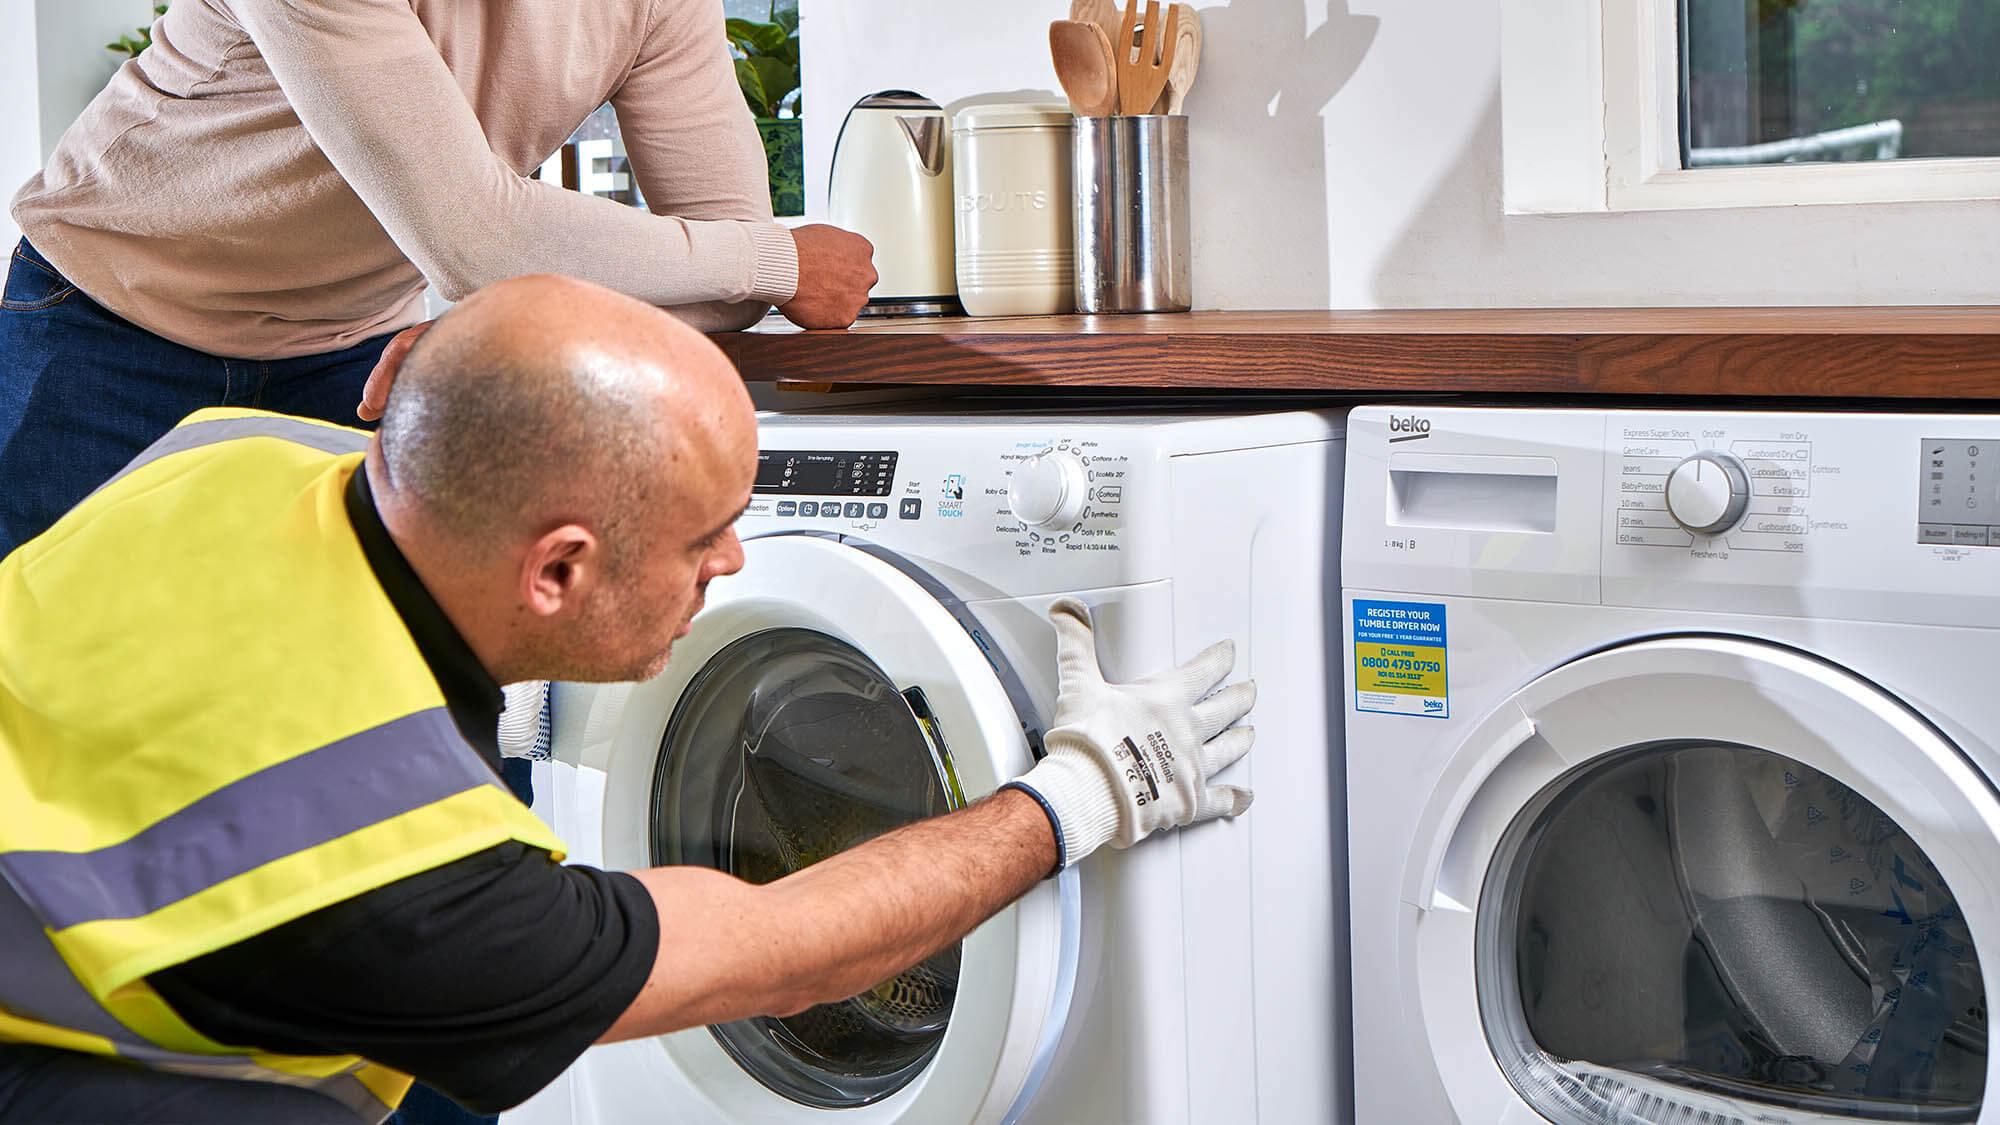 AO Repair & Care | Appliance repair and protection service | ao com